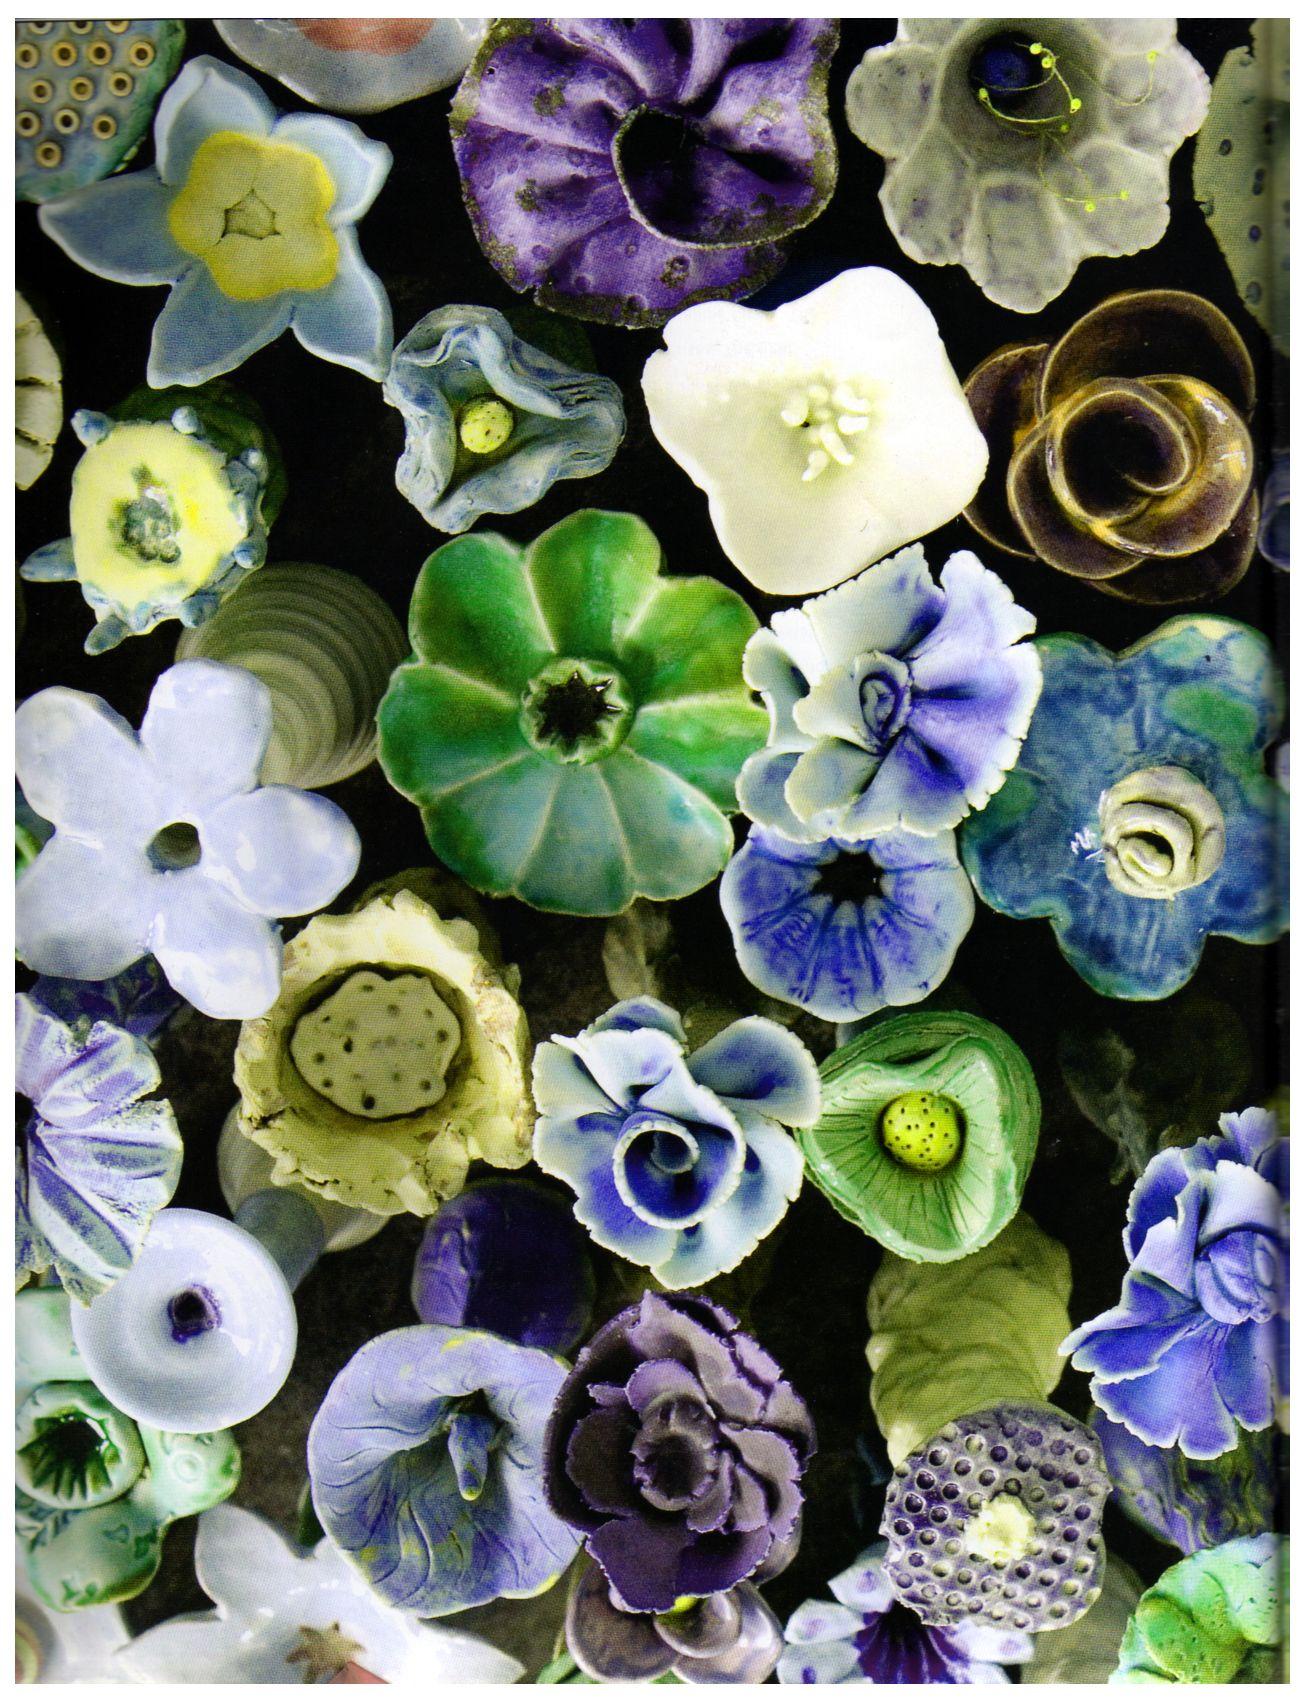 Bloom magazine Issue 17 | Bloom, Art inspiration, Floral